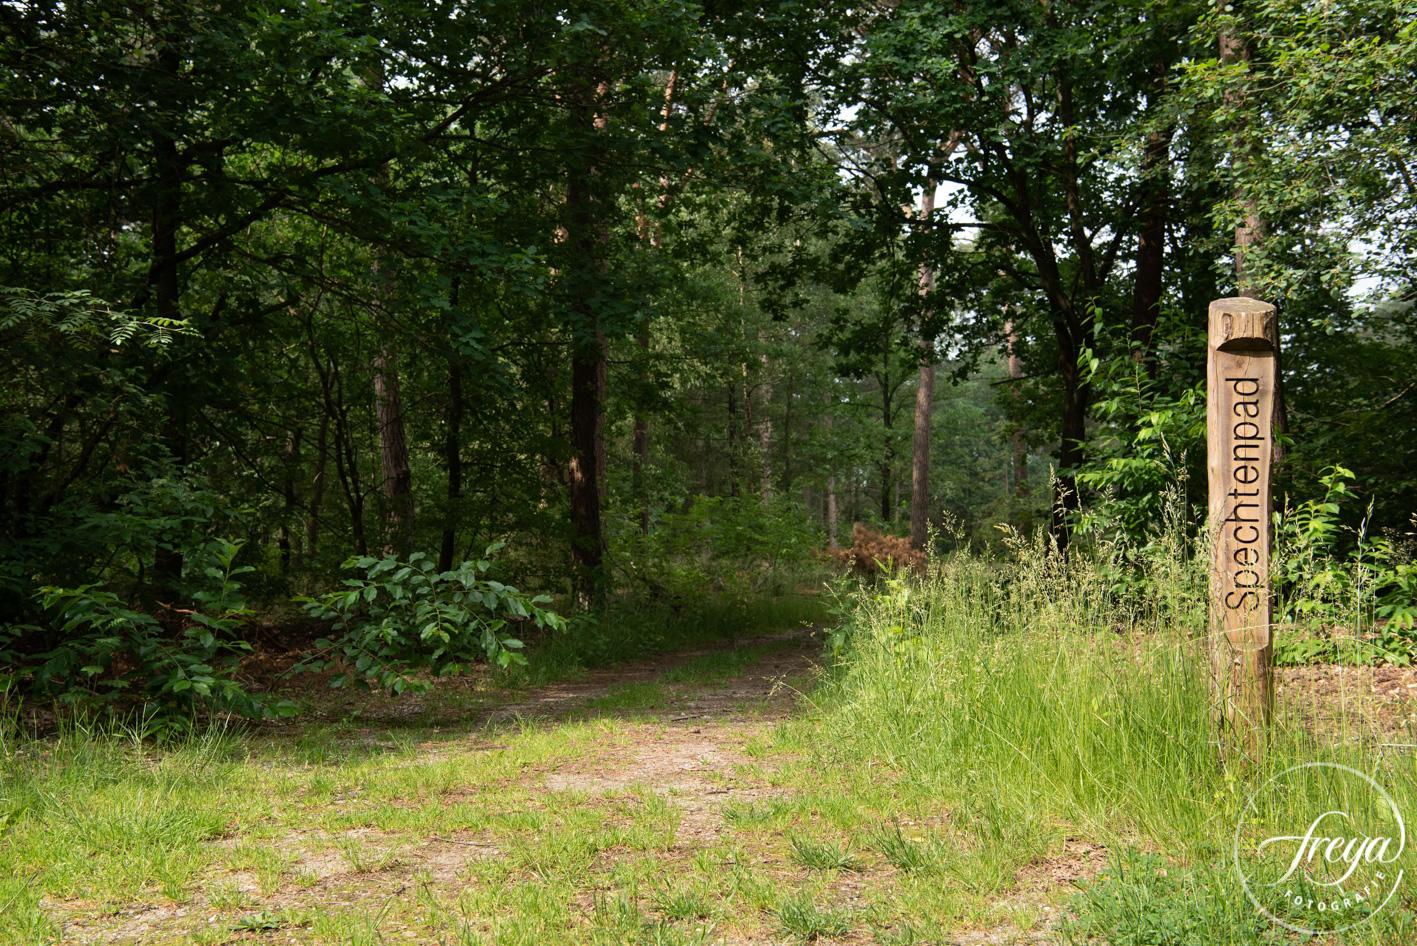 Natuurbegraafplaats Maashorst te Schaik - naambordje naast pad